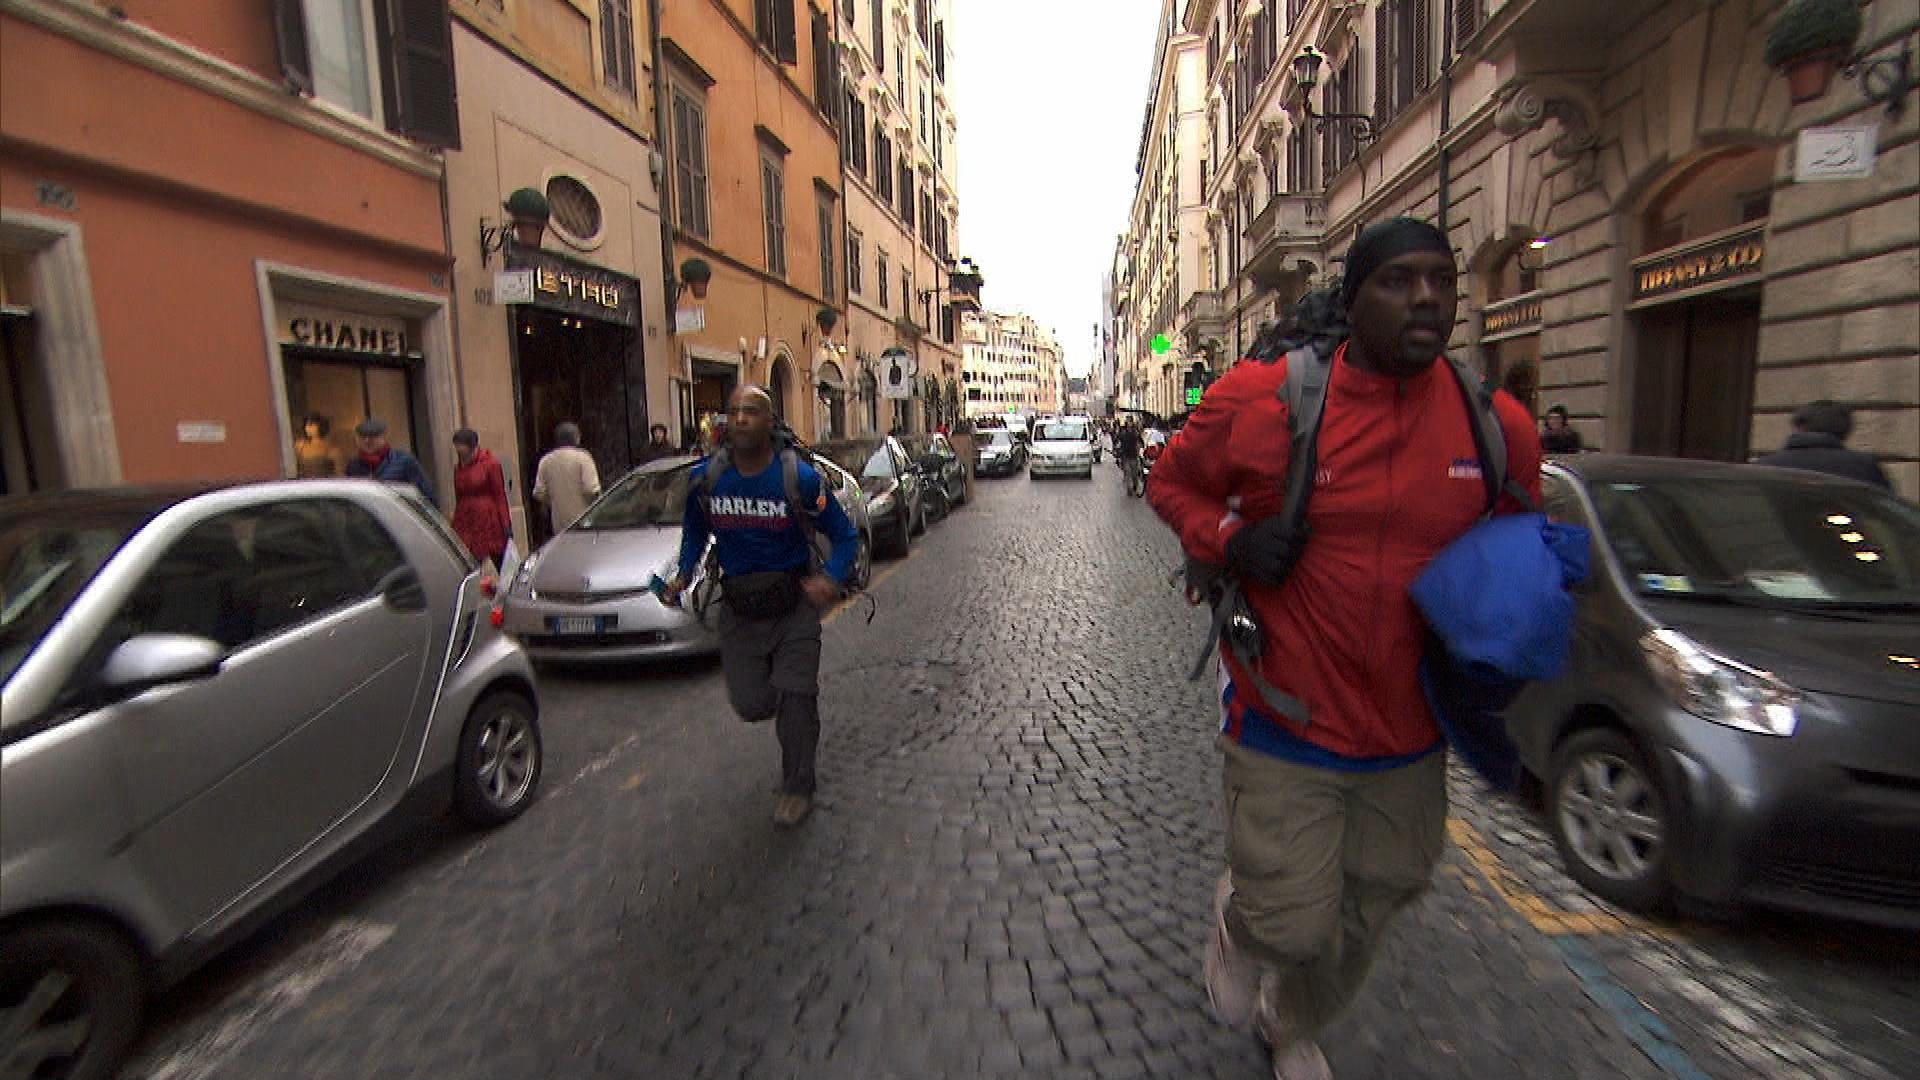 Running through Rome in Season 24 Episode 7